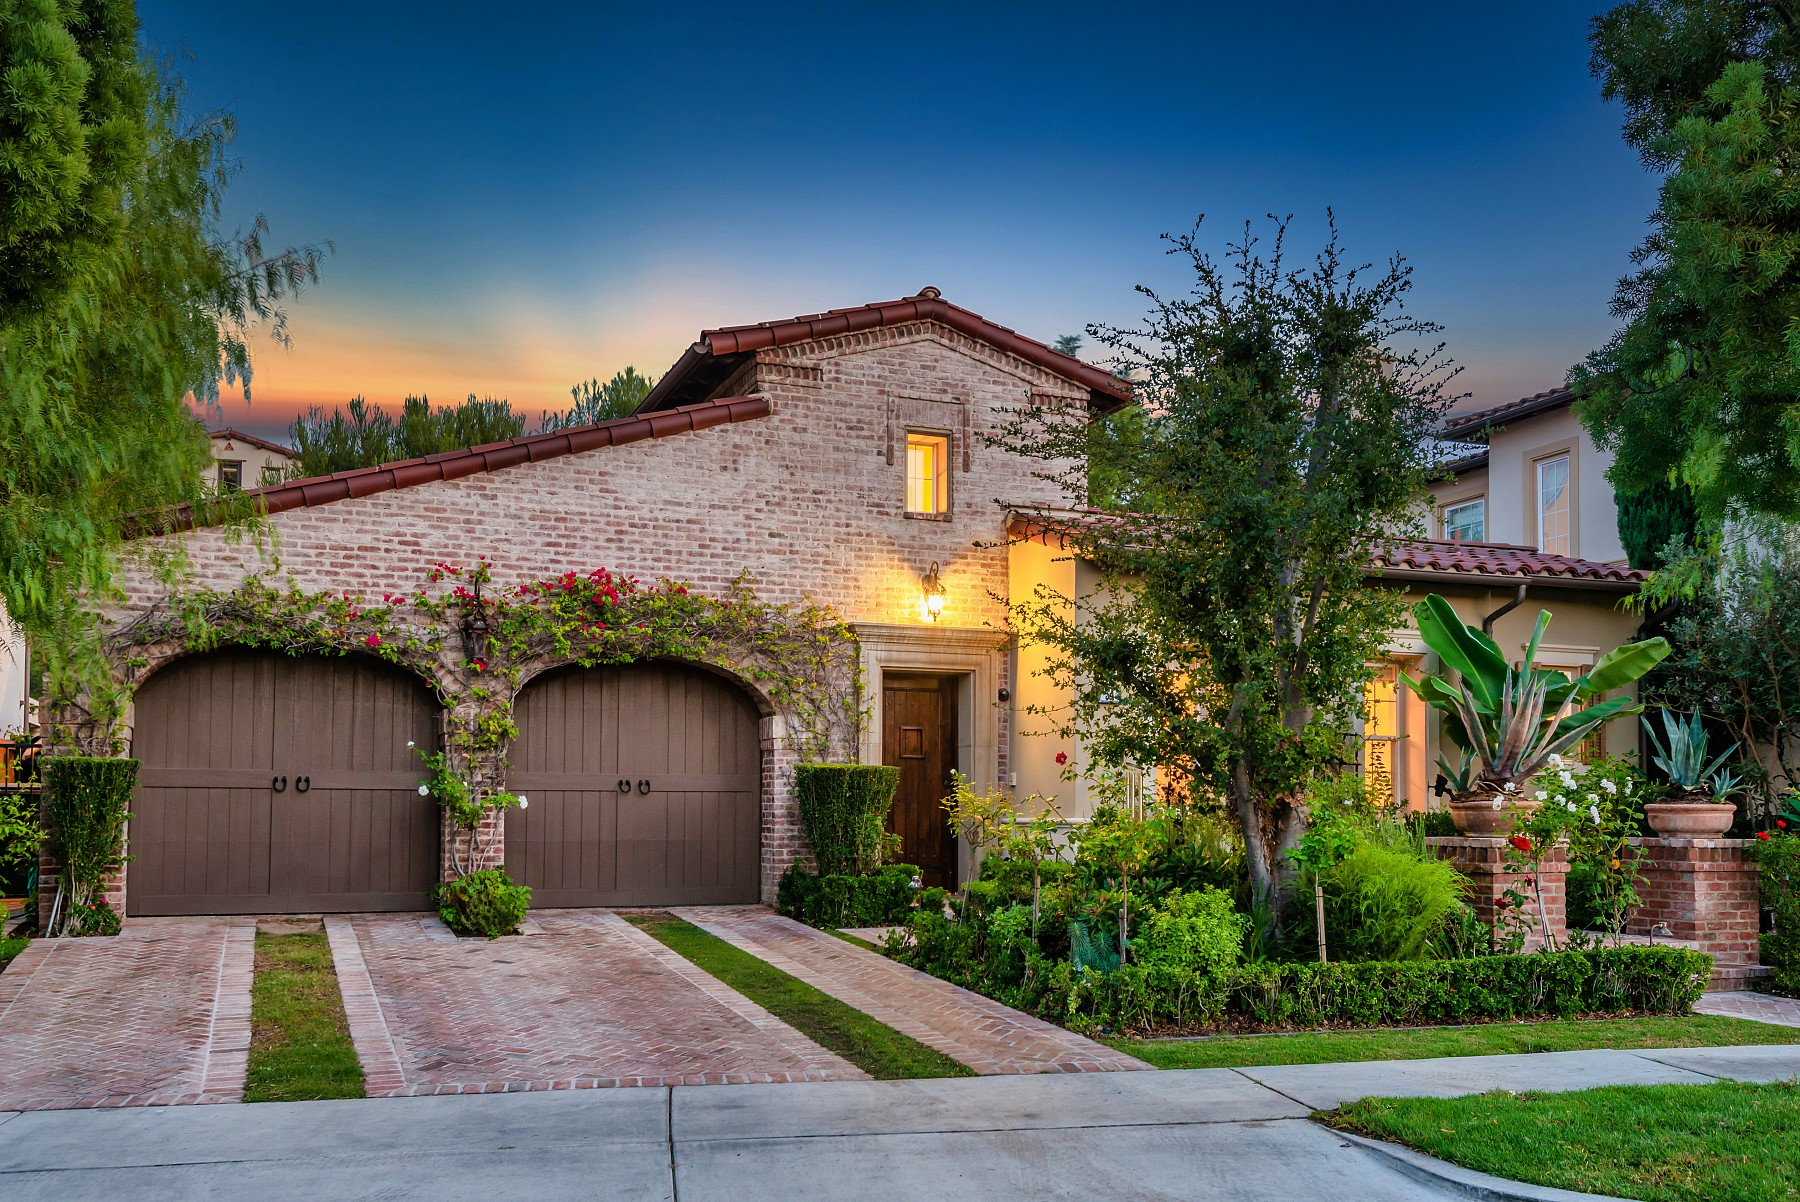 54 Shady Lane, Irvine, CA 92603